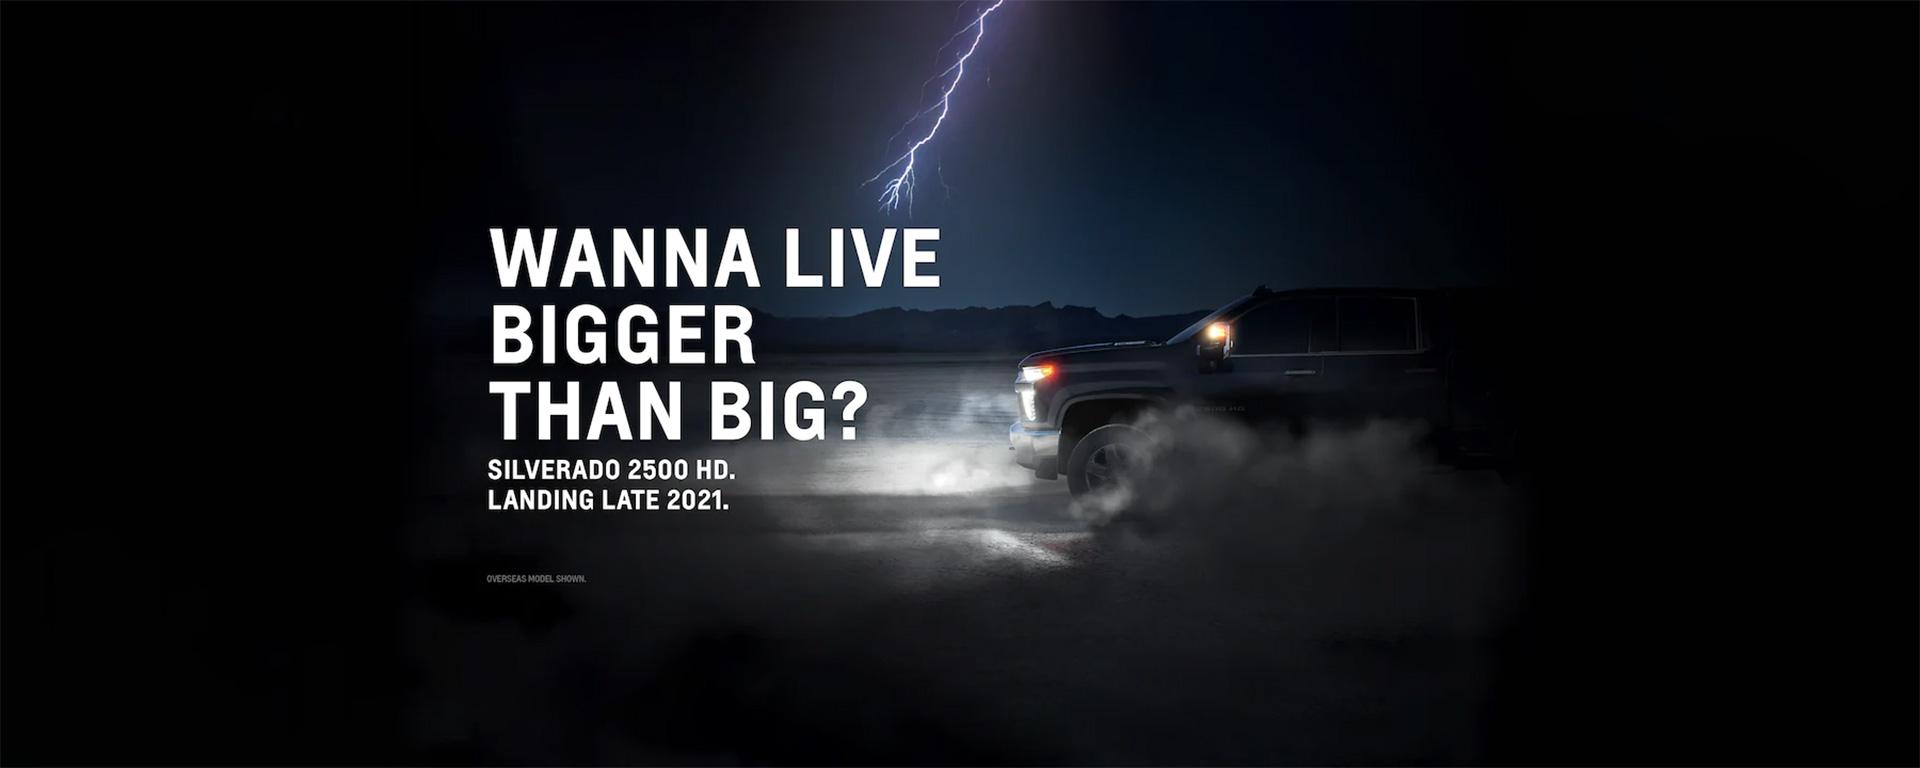 Silvarado 2500 HD